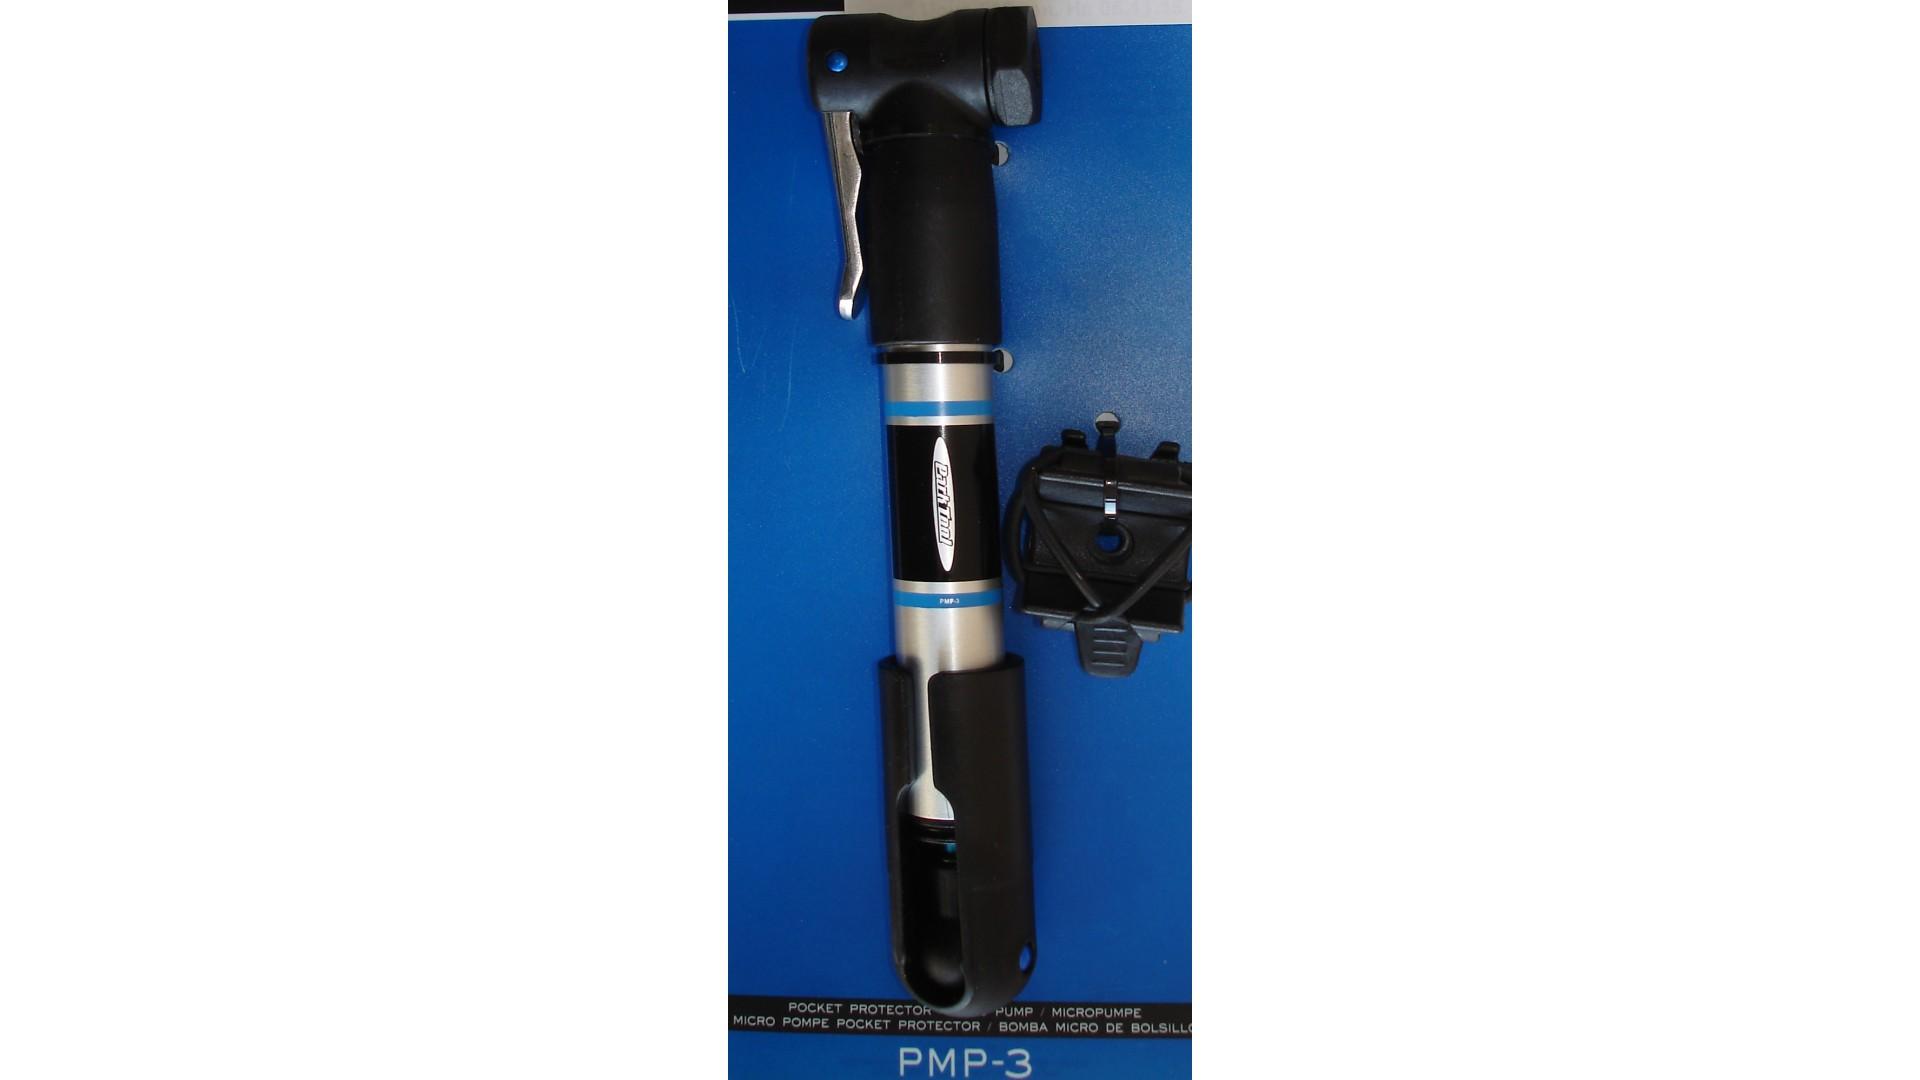 Мининасос Park Tool max 100 psi / 7 bar